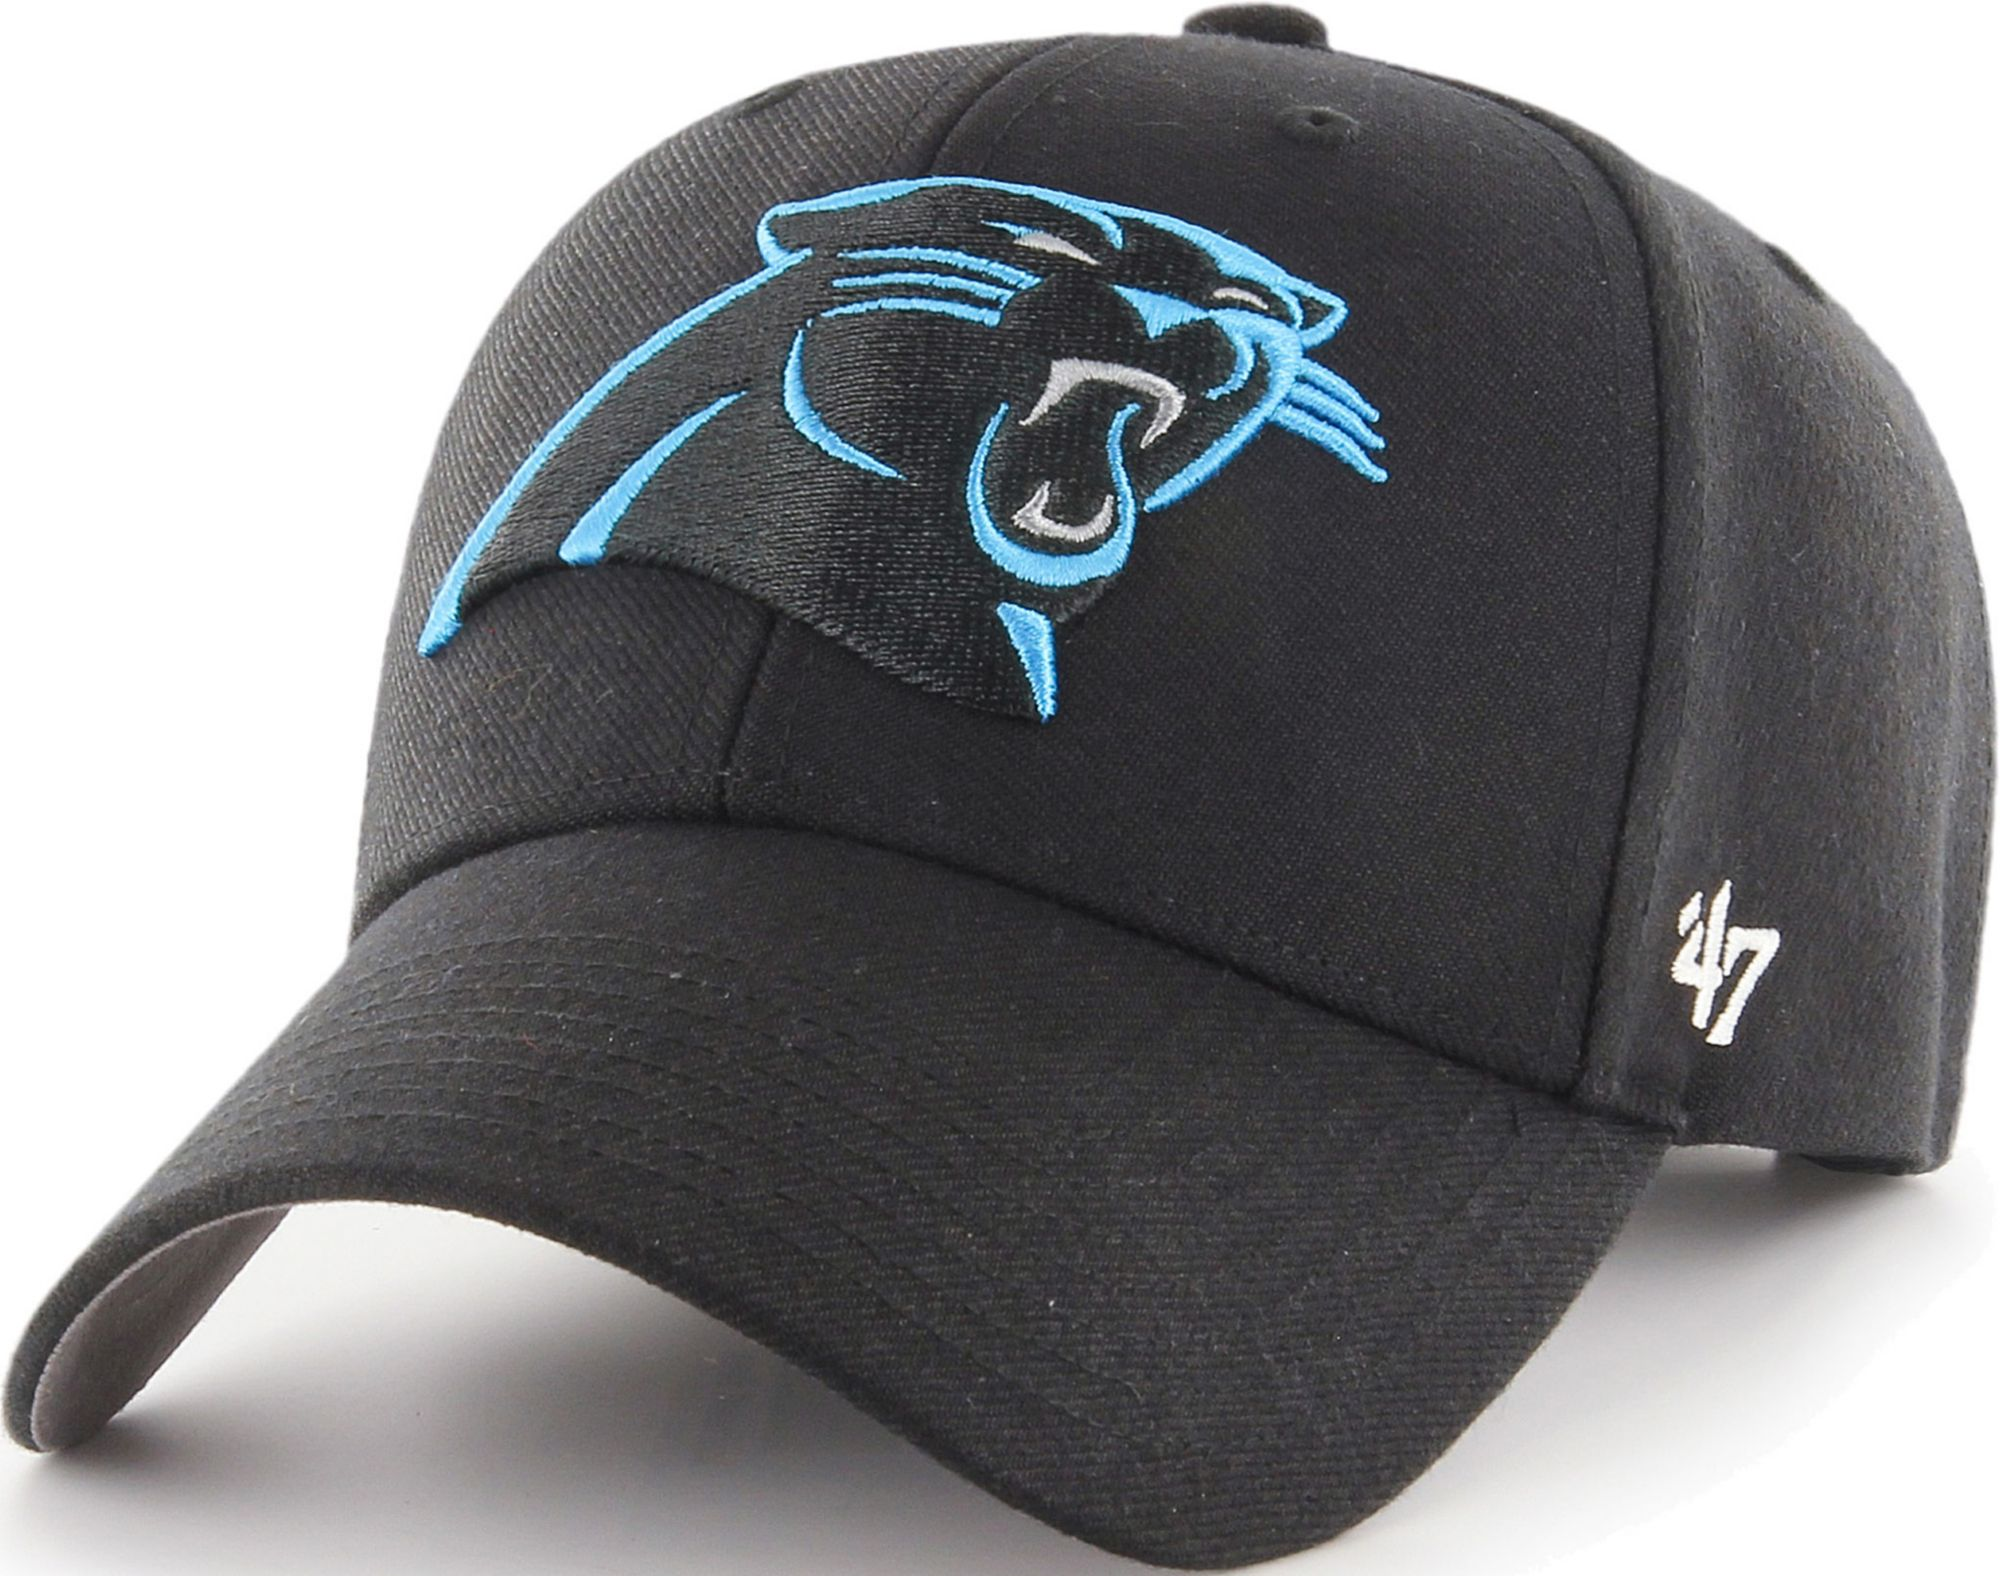 buy online 0528b e097d ... switzerland 47 mens carolina panthers mvp black adjustable hat e6a74  76f5f